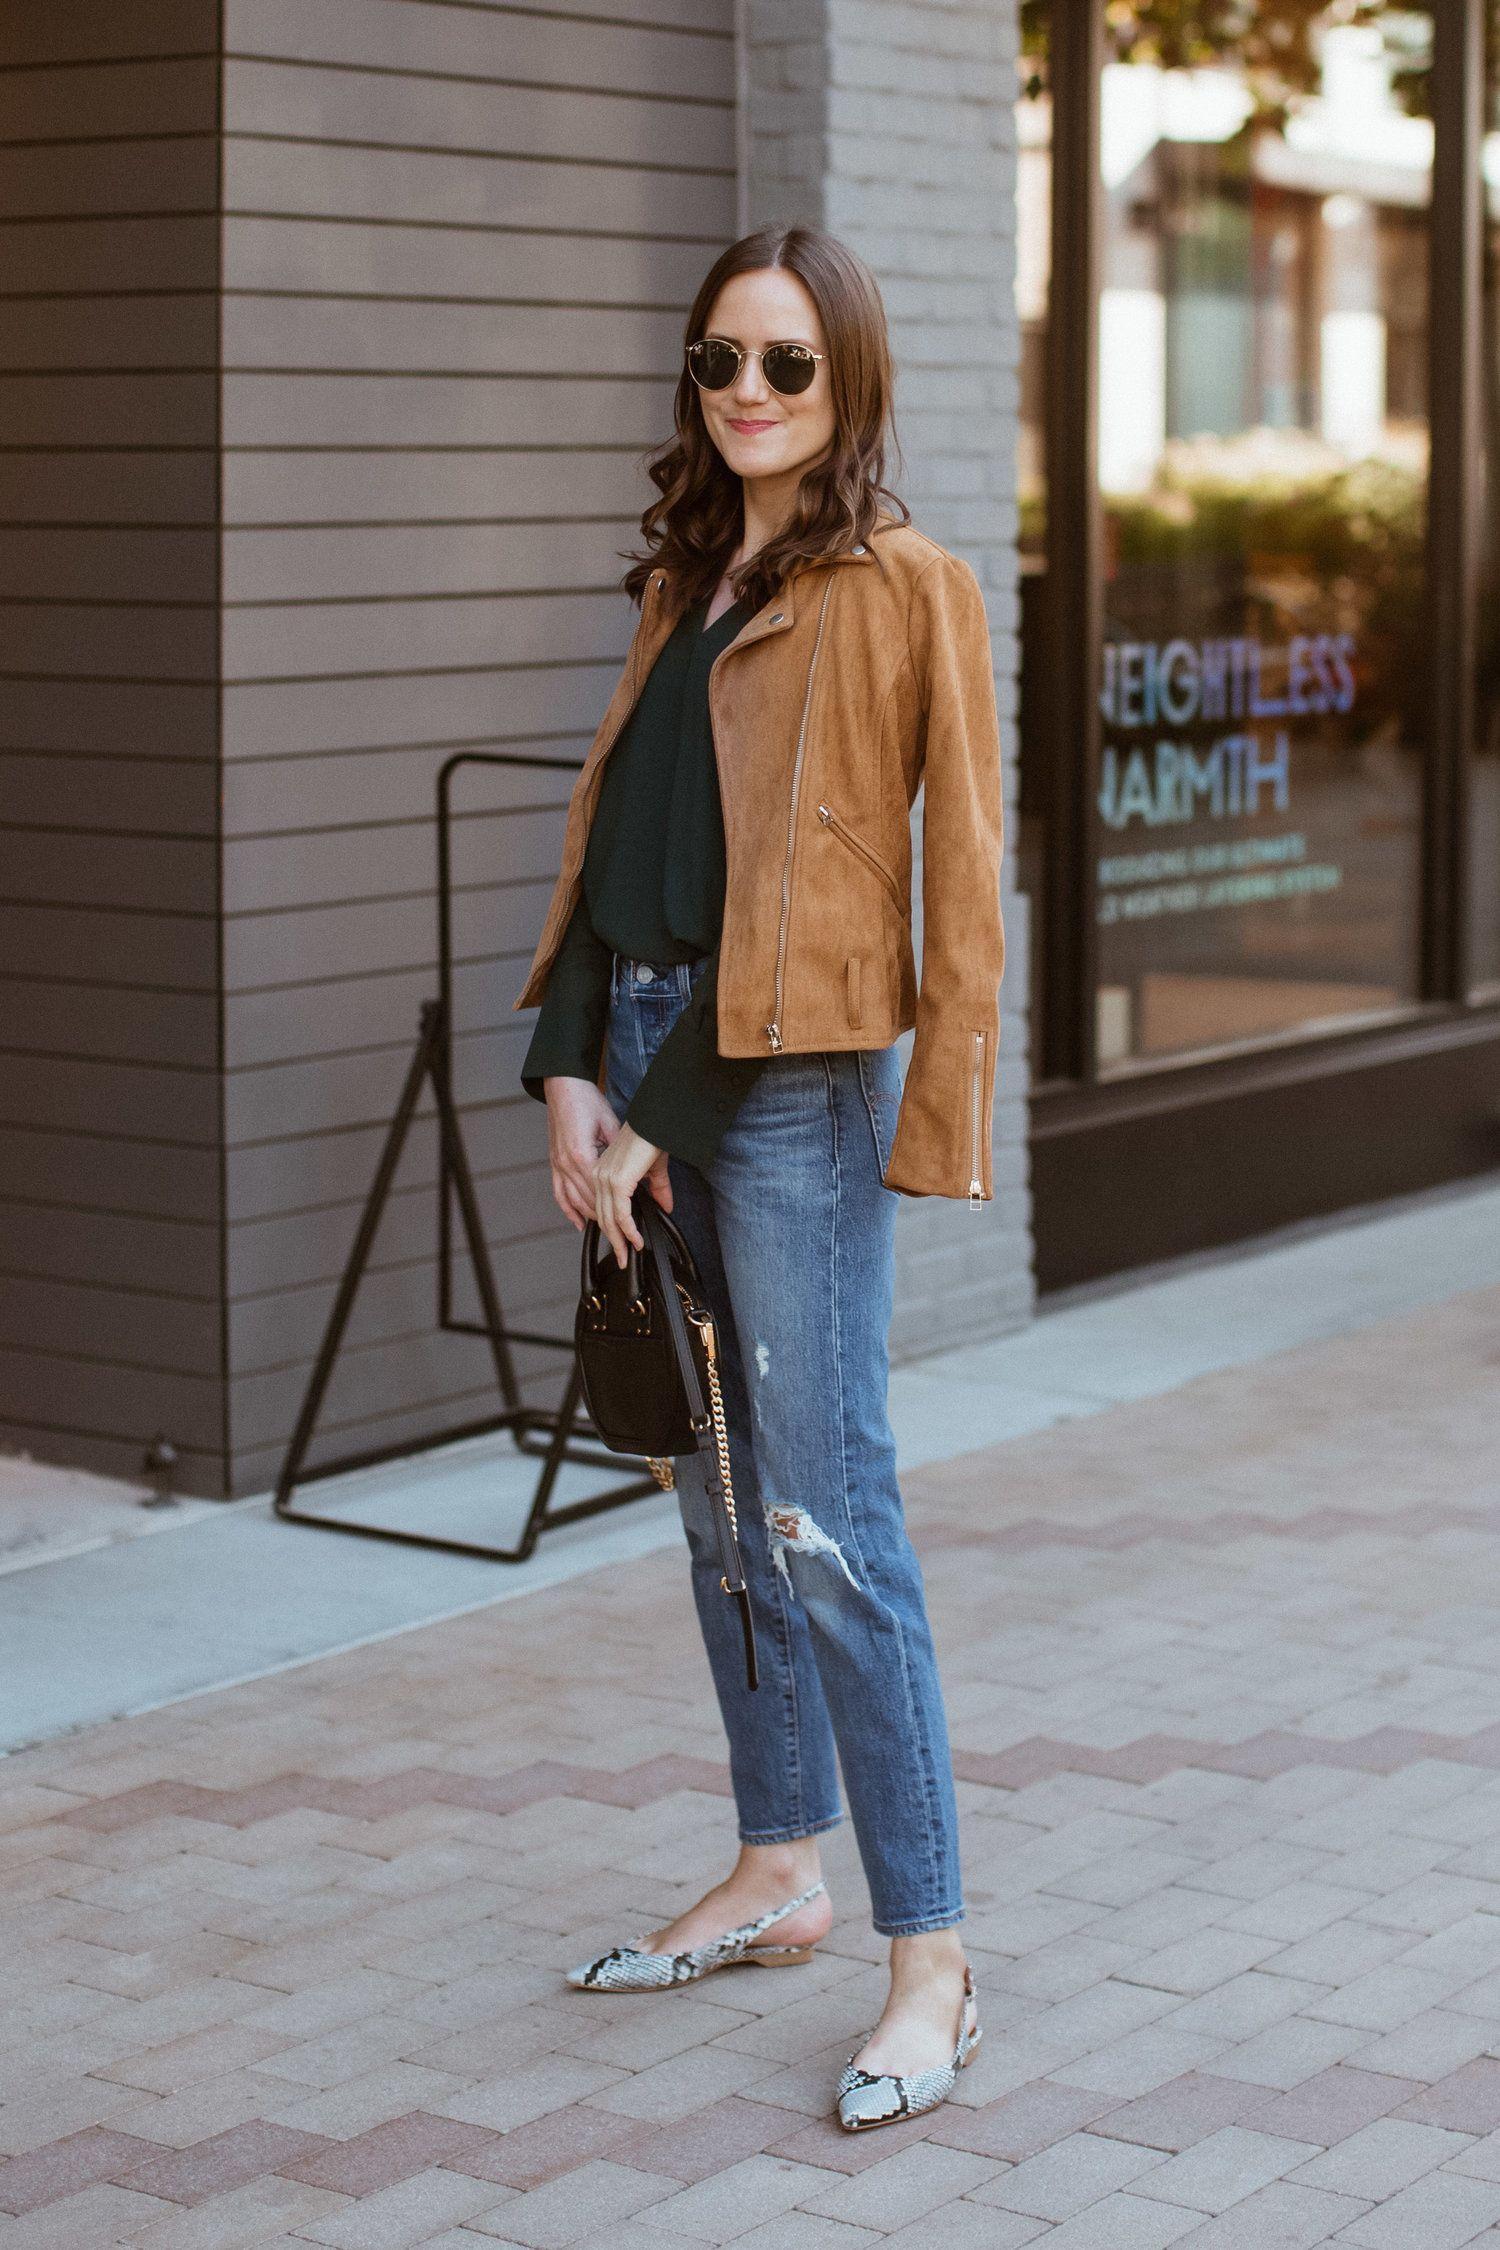 Jacket: suede, sand color, pretty, jeans, cream, nude